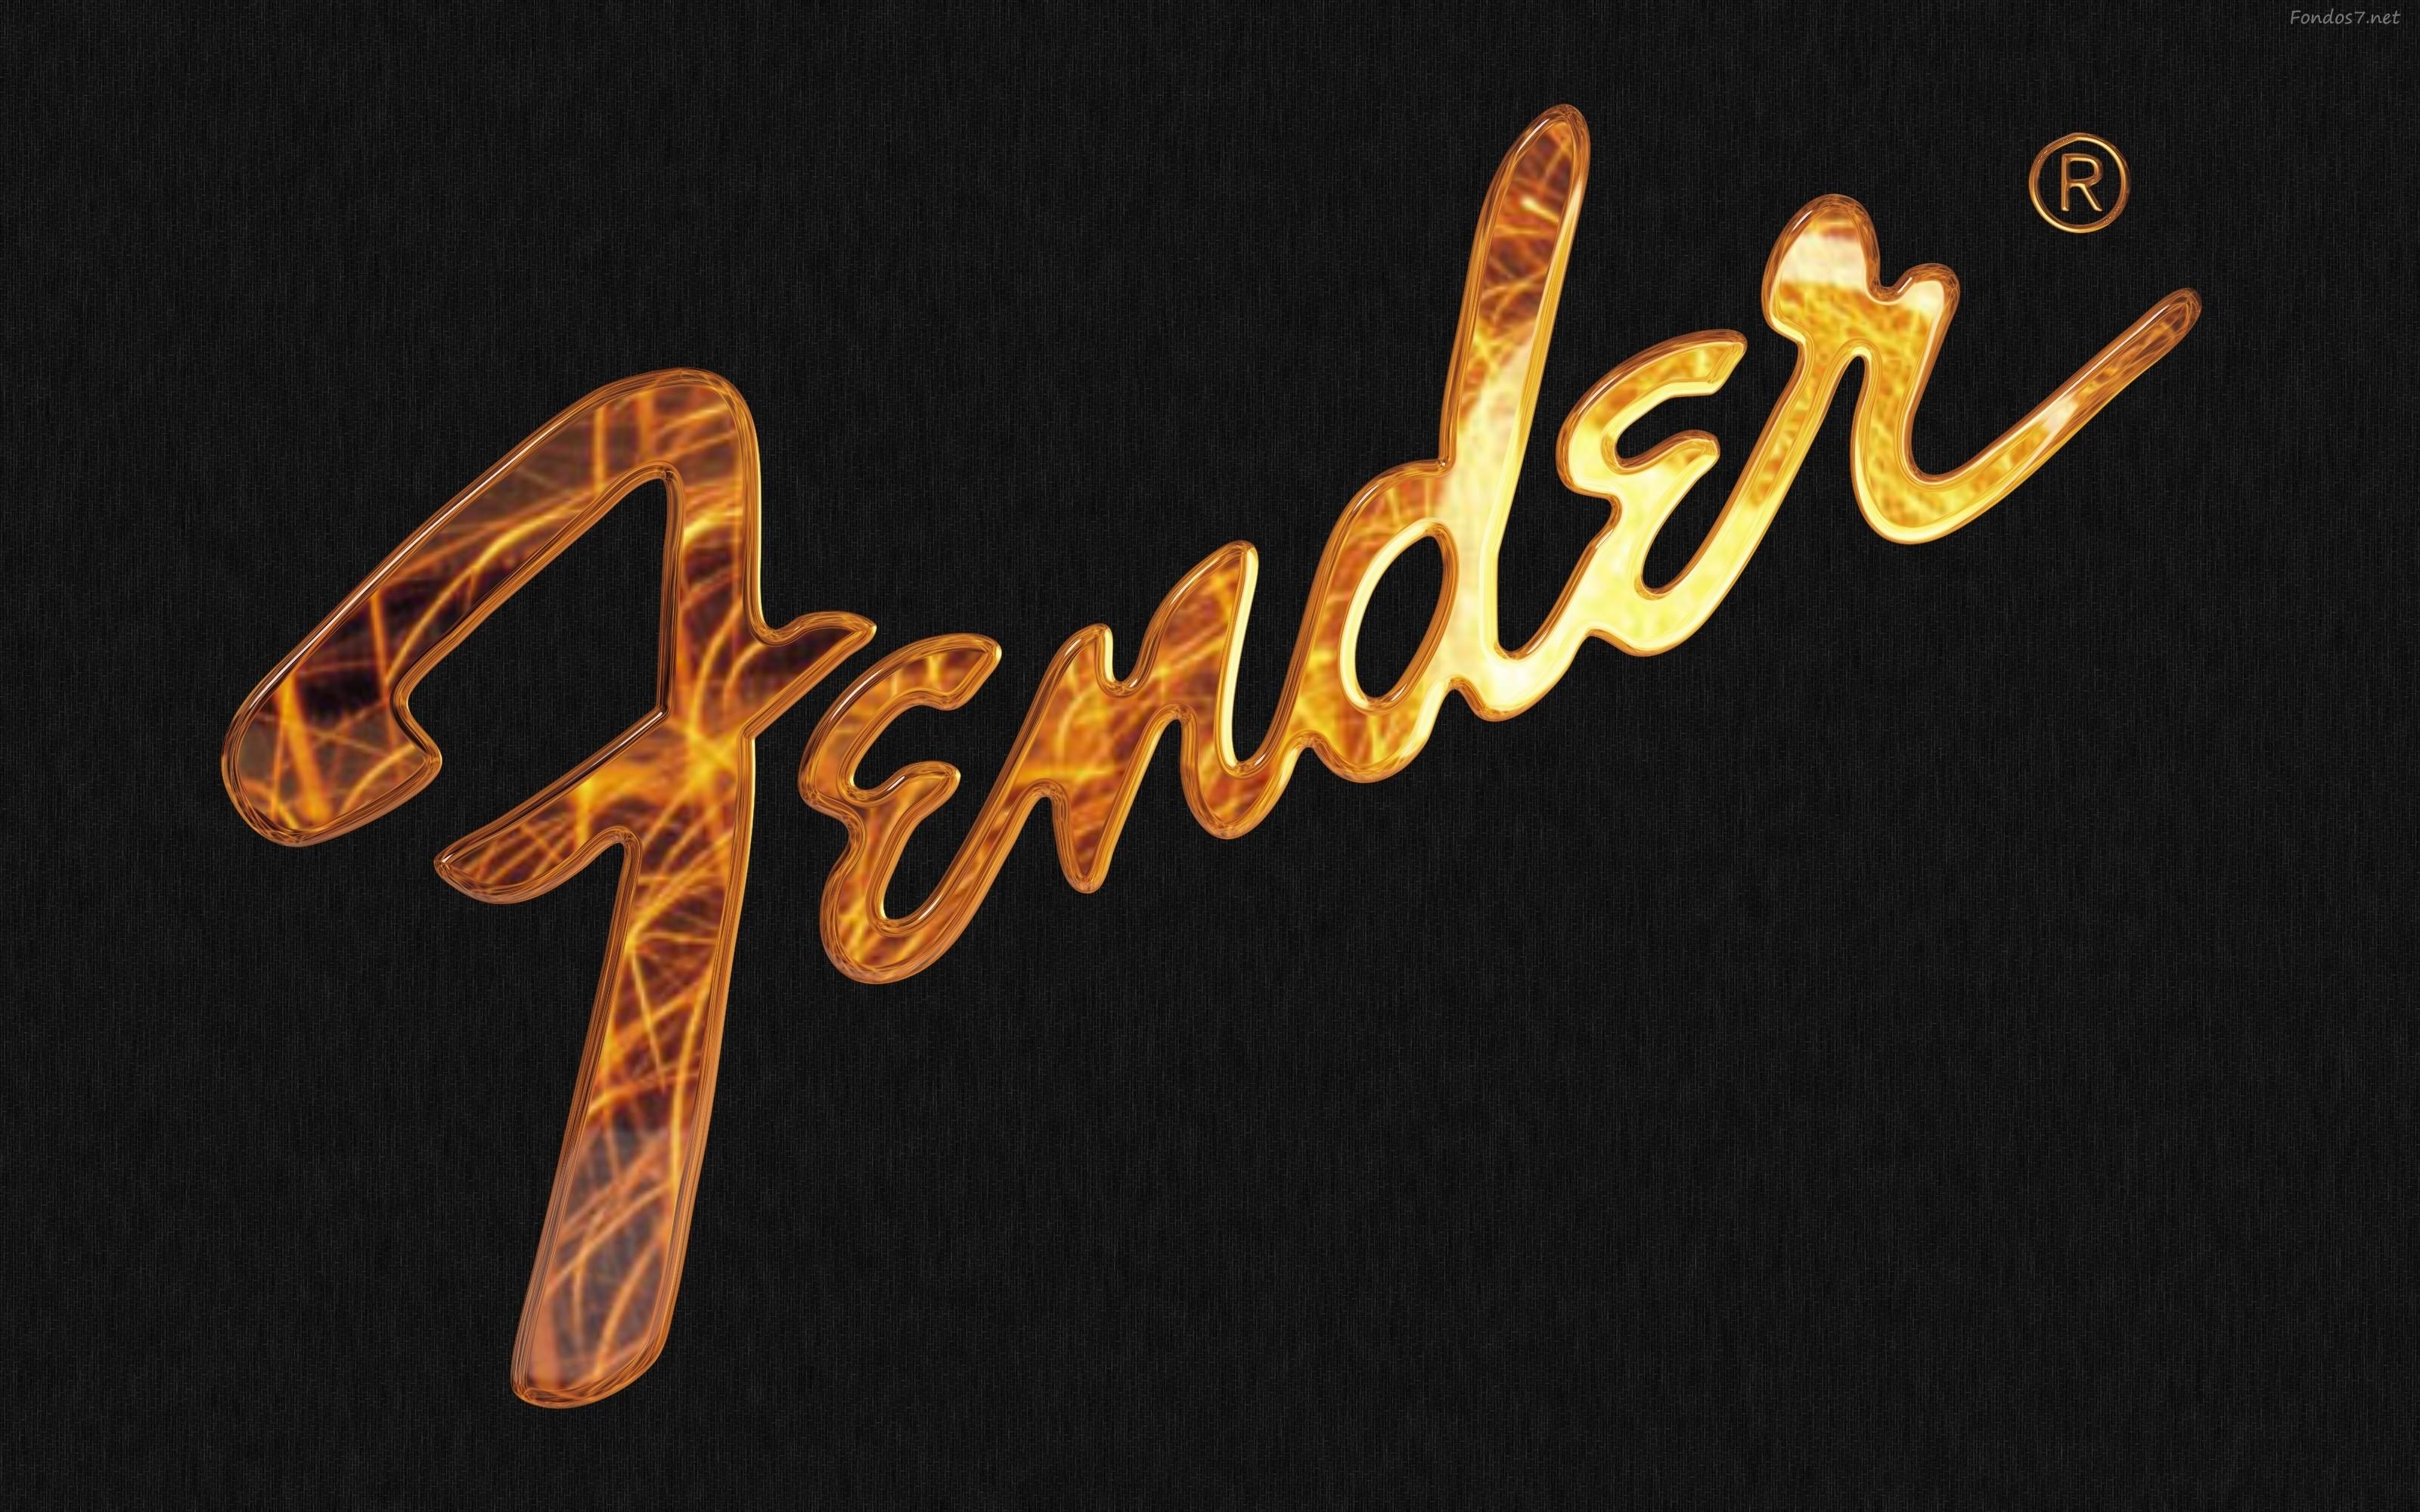 Fender Text Black Wallpaper HD Widescreen